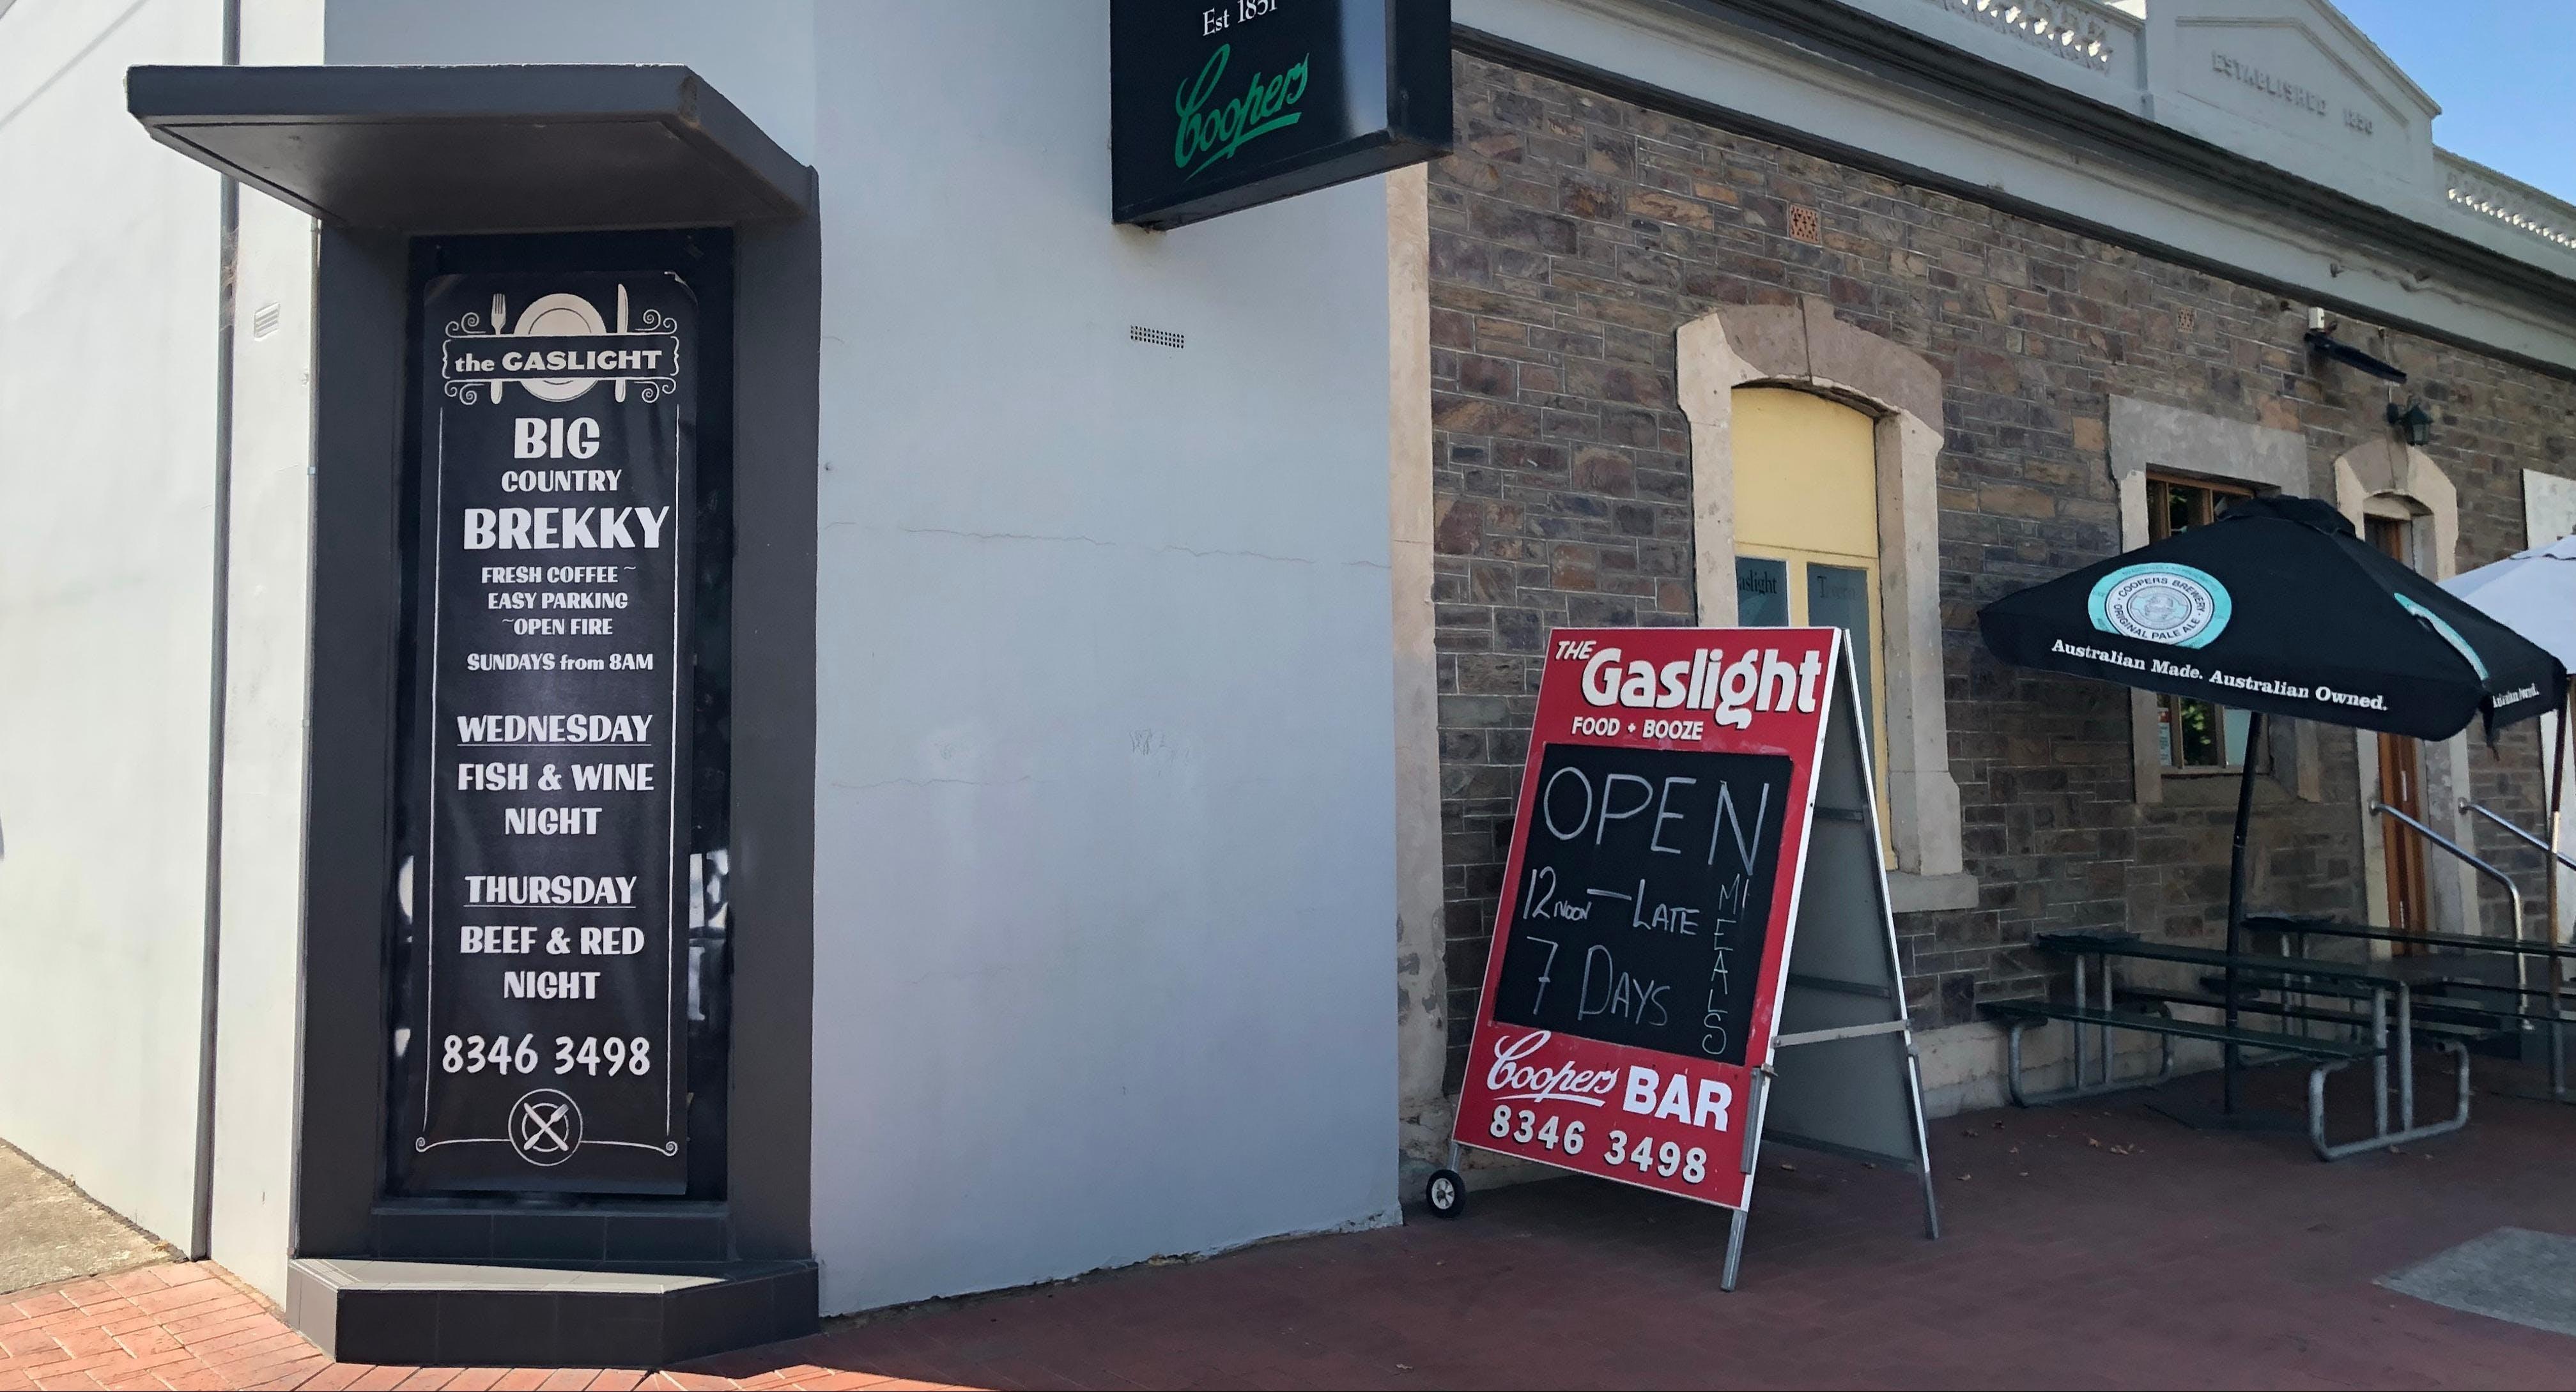 Gaslight Tavern Adelaide image 2